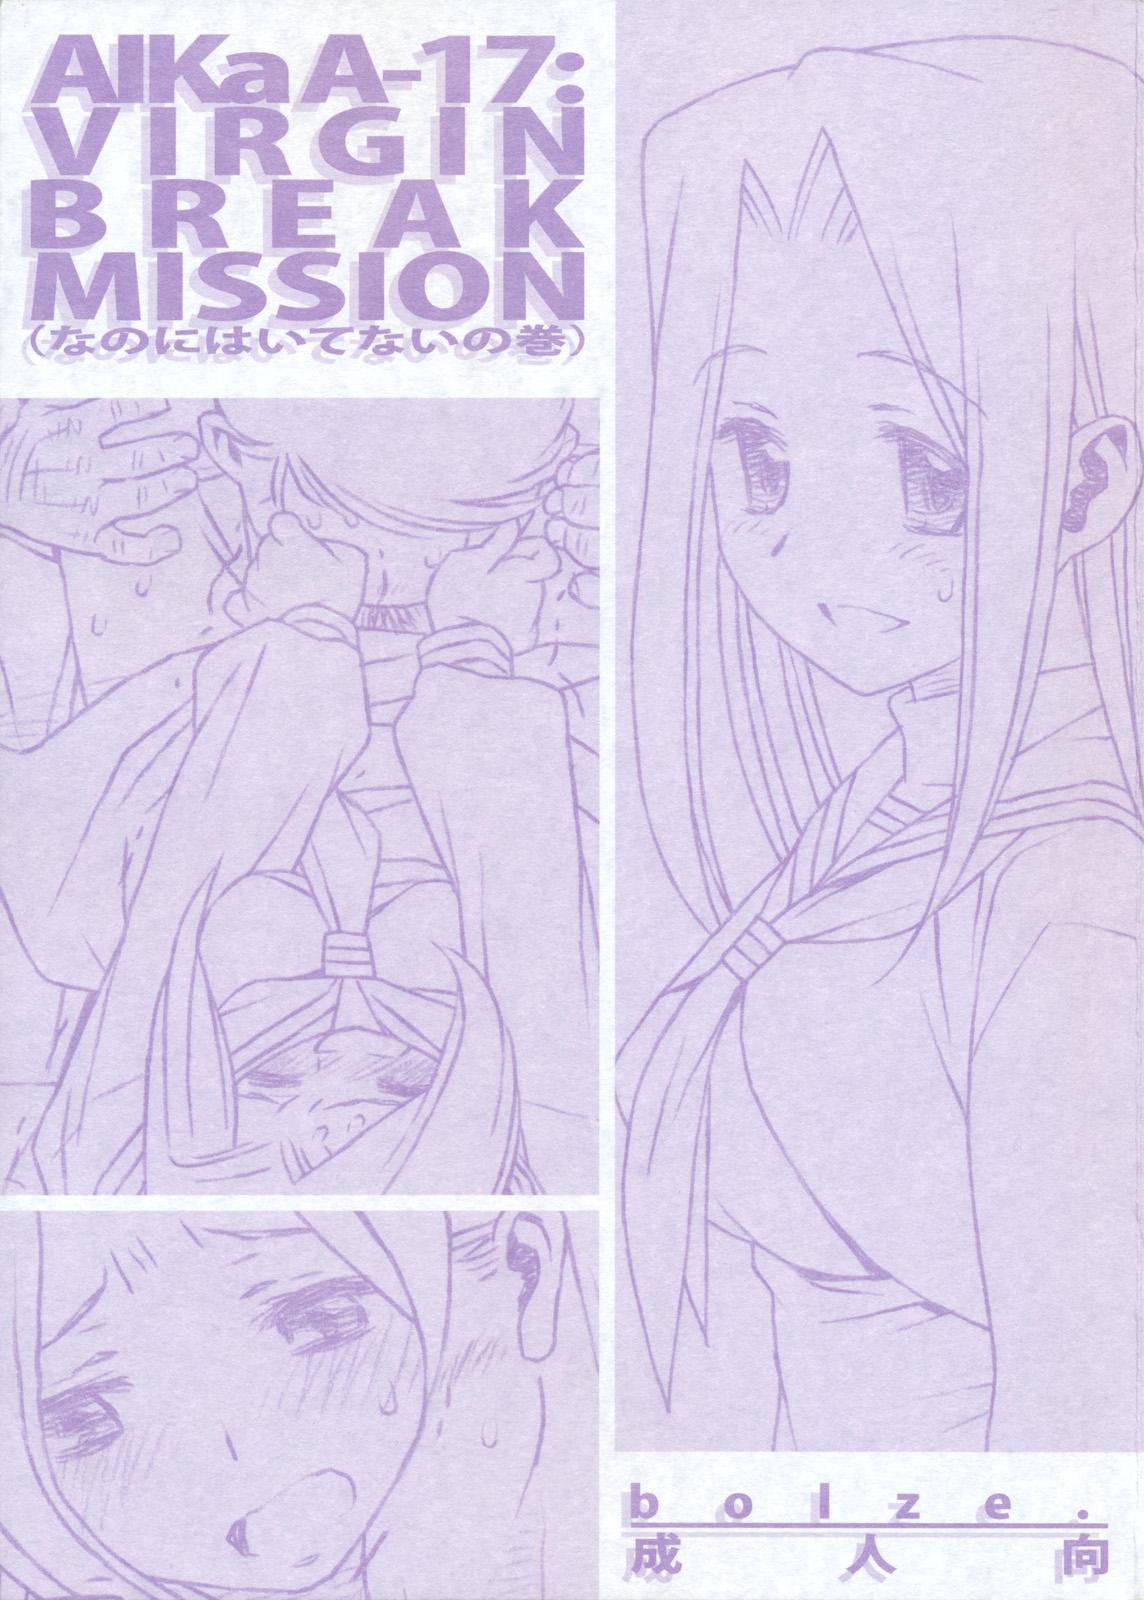 AIKAa A-17: VIRGIN BREAK MISSION 0